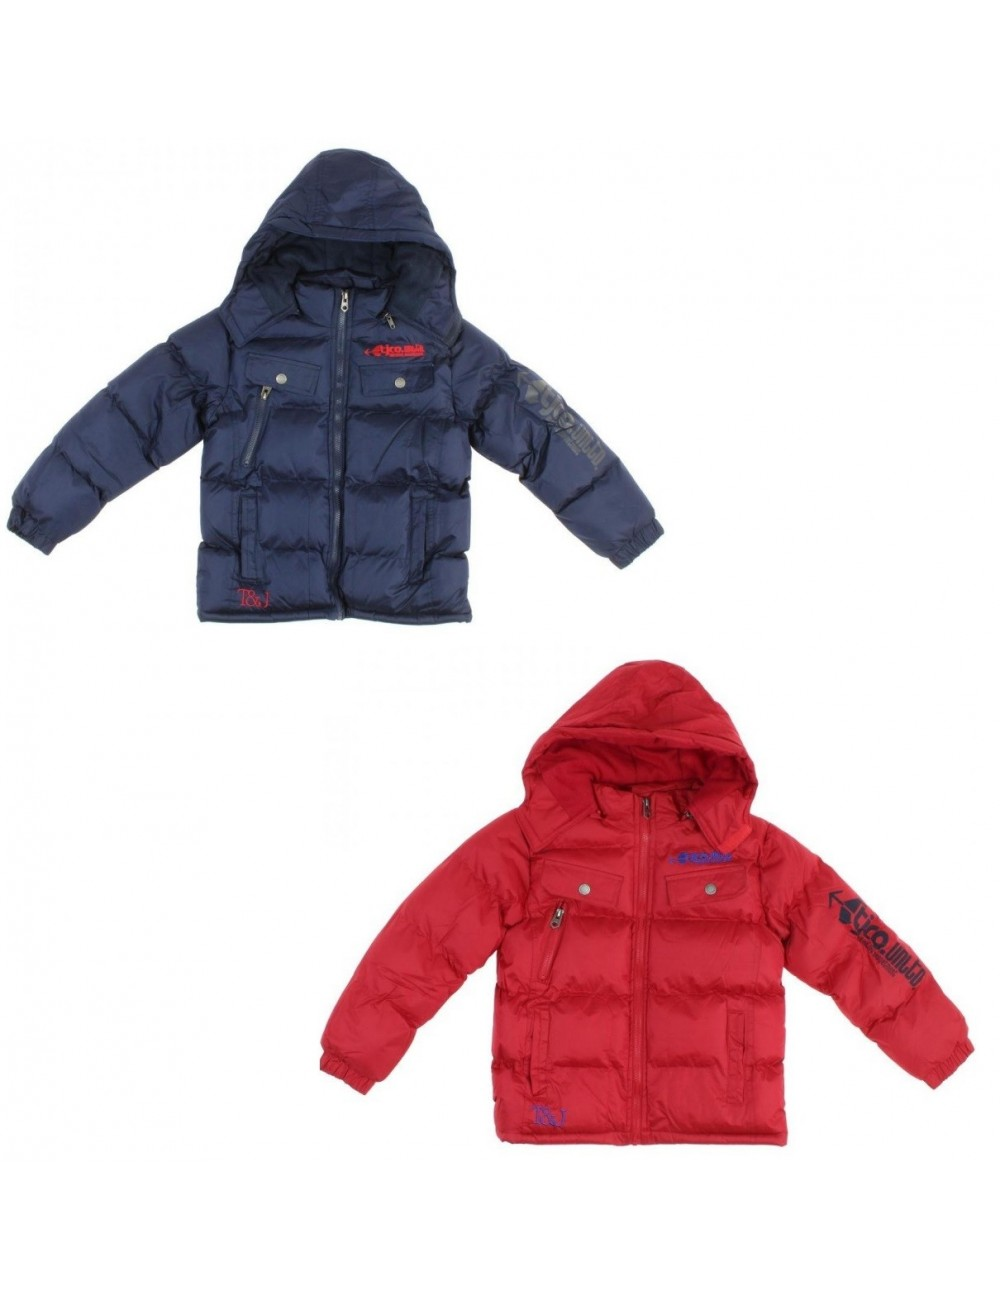 Jacheta de iarna baieti 6-14 ani Tom & Jo